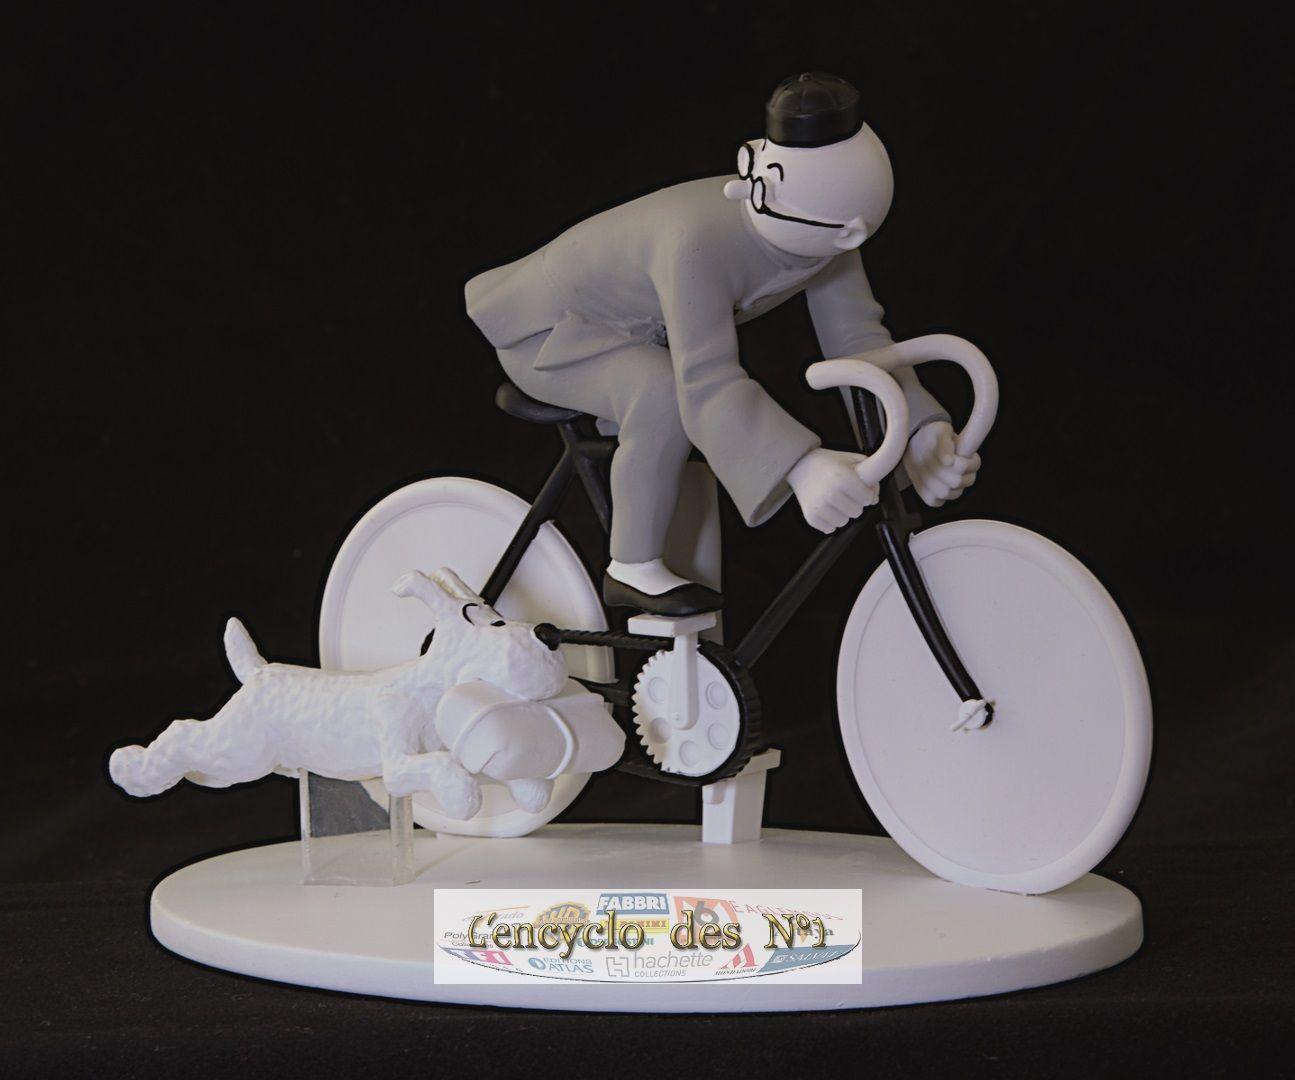 Les Aventures de Tintin :: Figurines Tintin, la collection officielle [TF1]